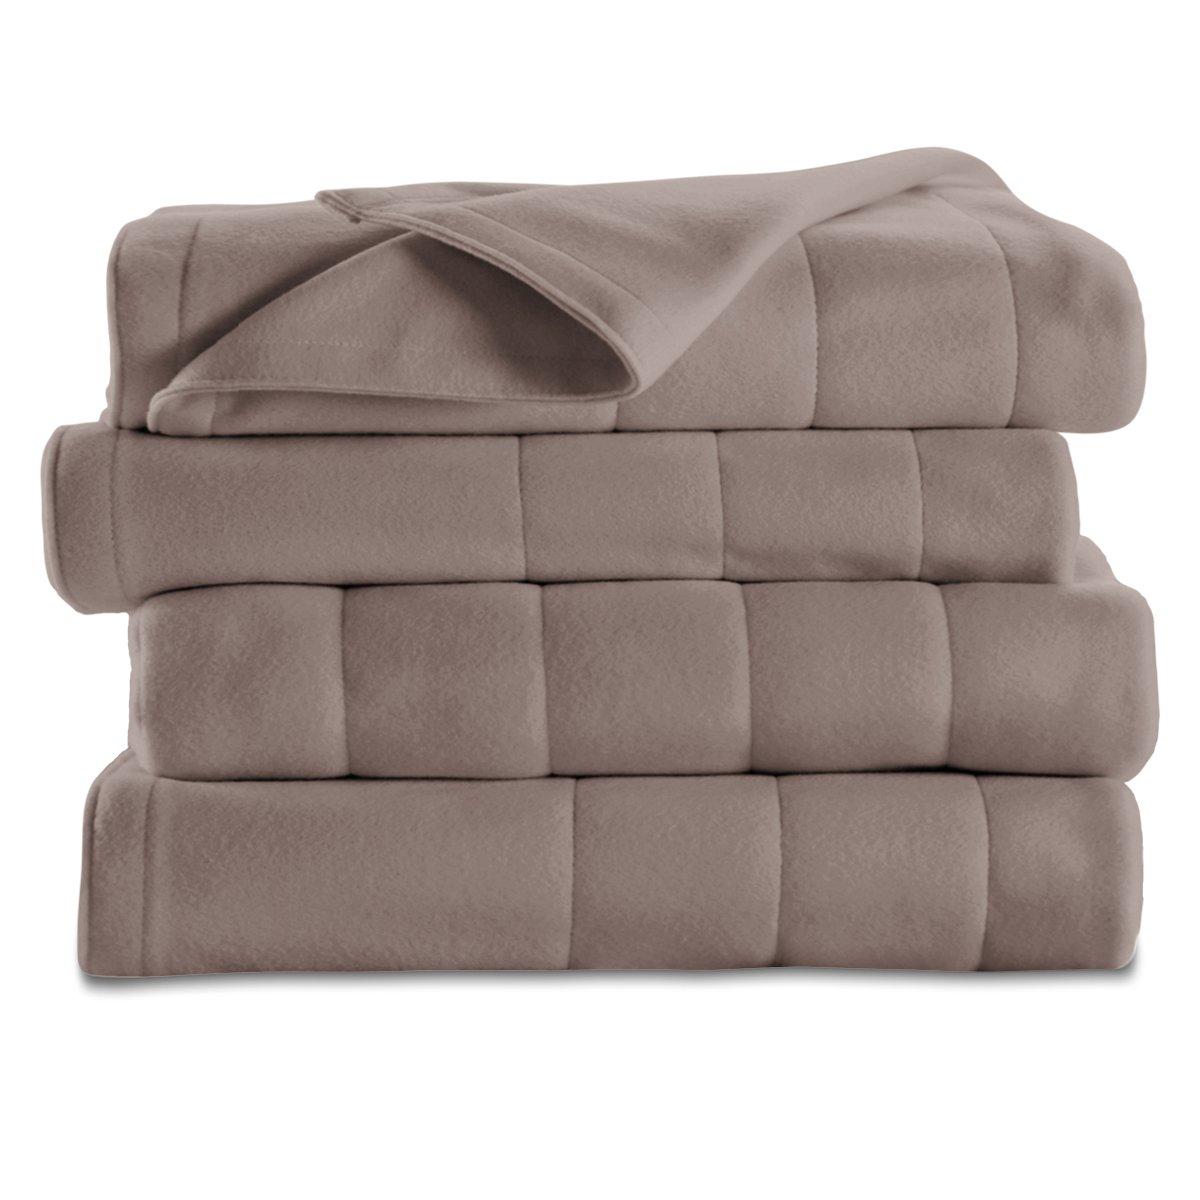 Sunbeam Quilted Fleece Heated Blanket, King, Mushroom, BSF9GKS-R772-13A00